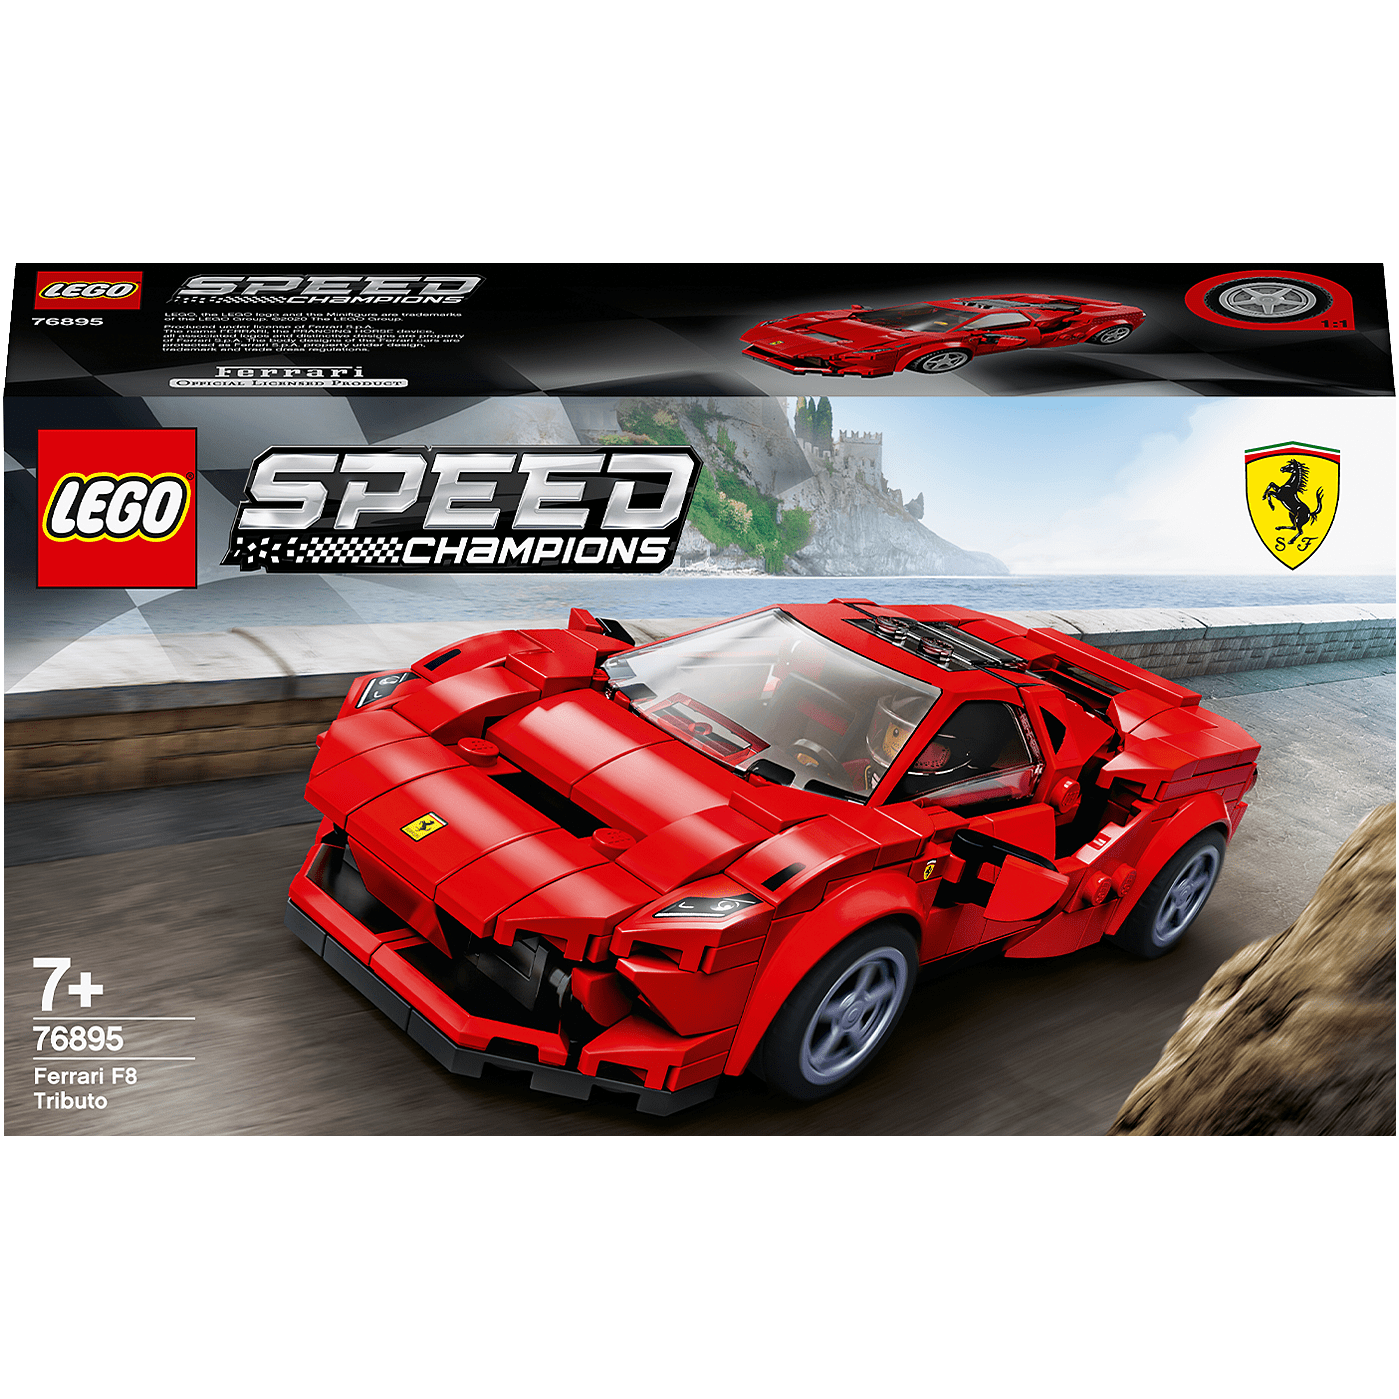 The Ferrari F8 Tributo Is The Most Powerful V8 Car Its: Buy LEGO 76895 Speed Champions: Ferrari F8 Tributo Race